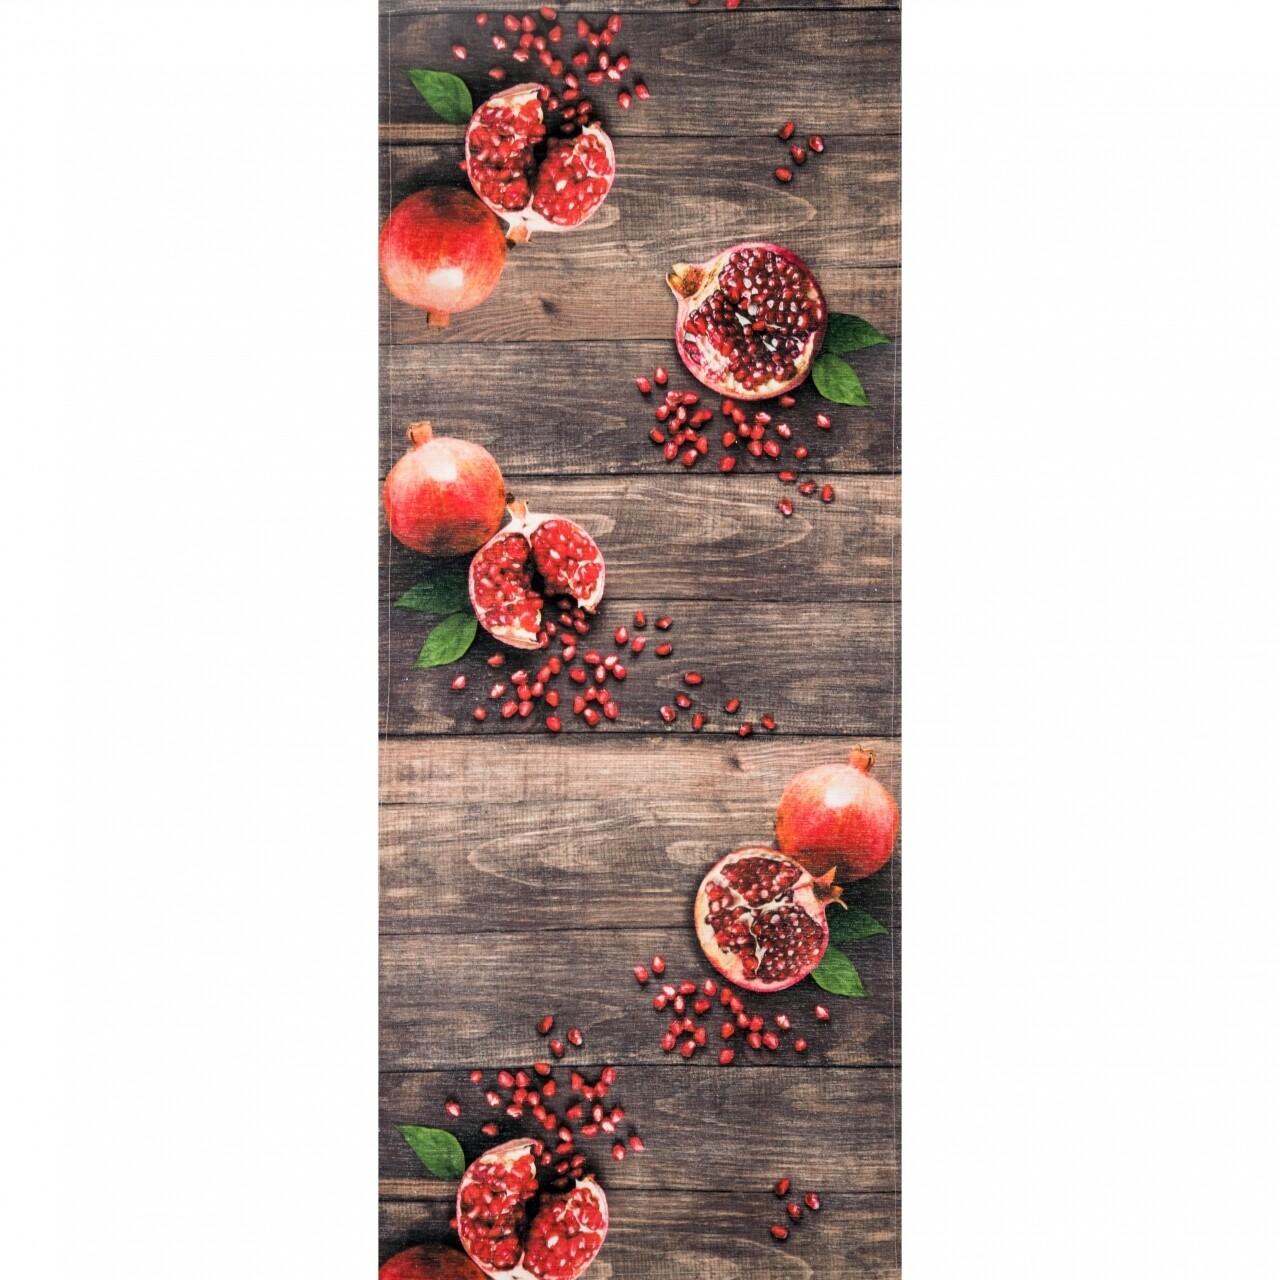 Covor rezistent Webtappeti MELOGRANA CM 58x240 cm, maro/rosu/verde